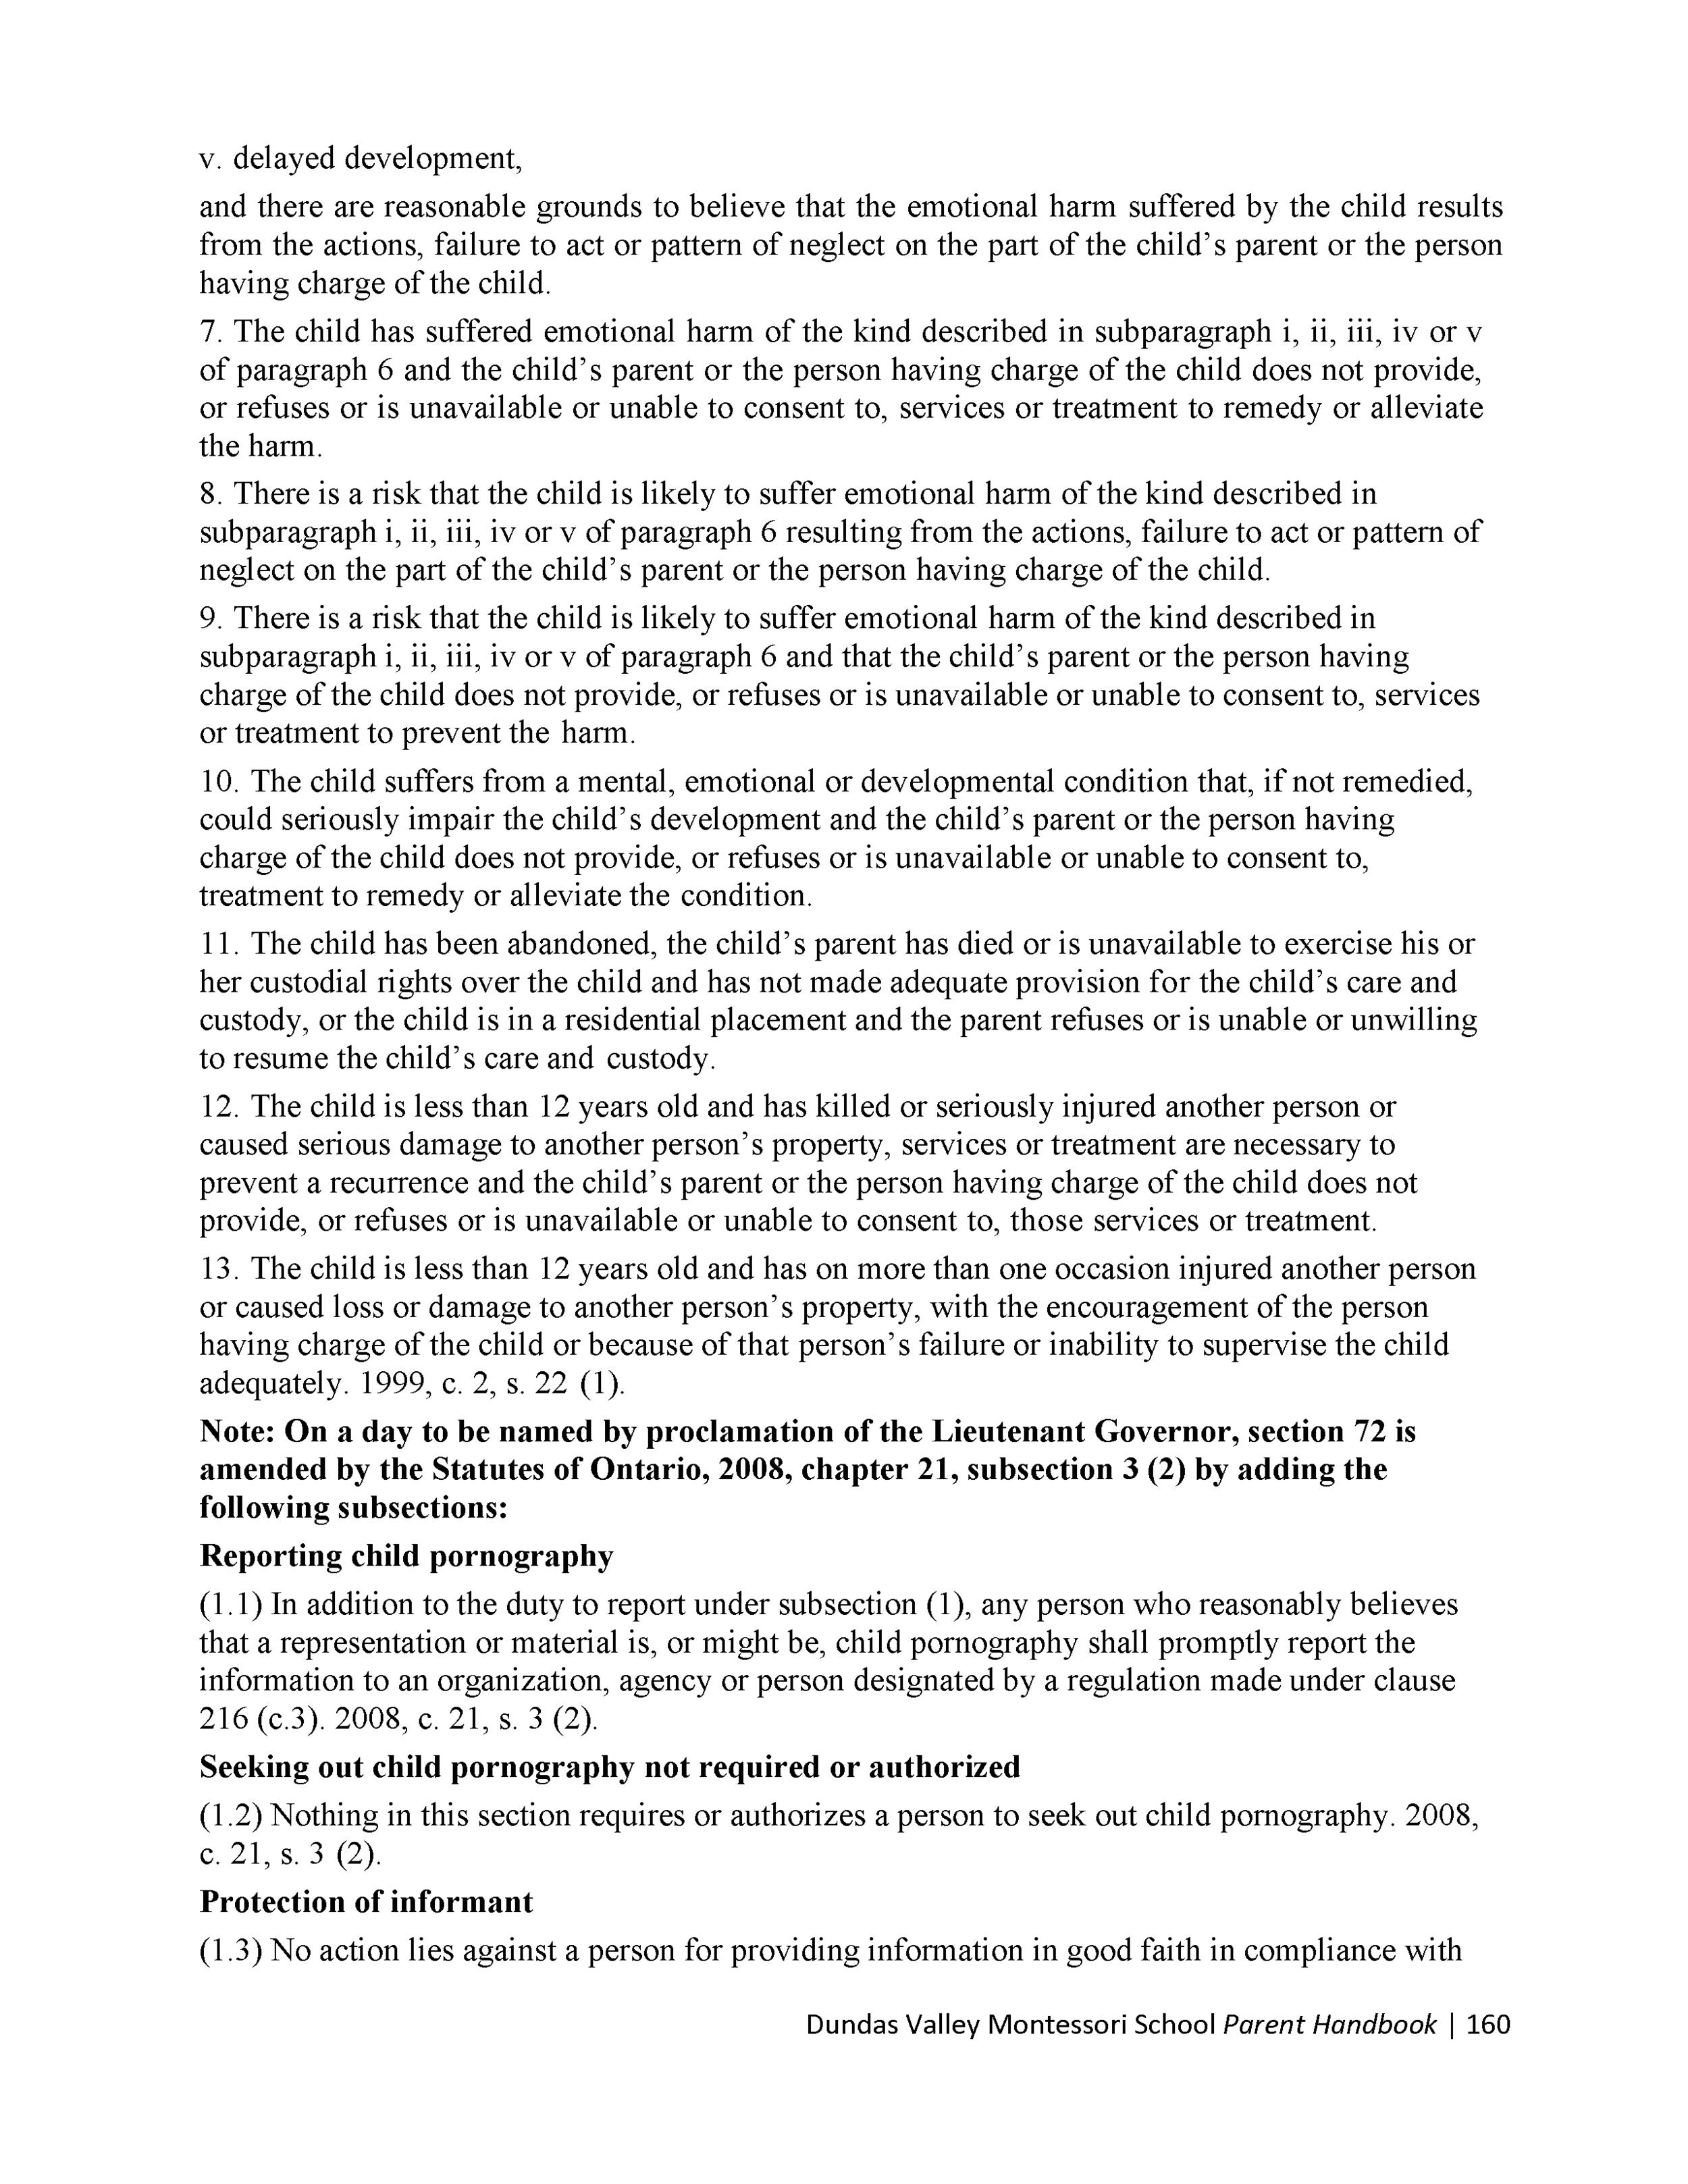 DVMS-Parent-Handbook-19-20_Page_162.png